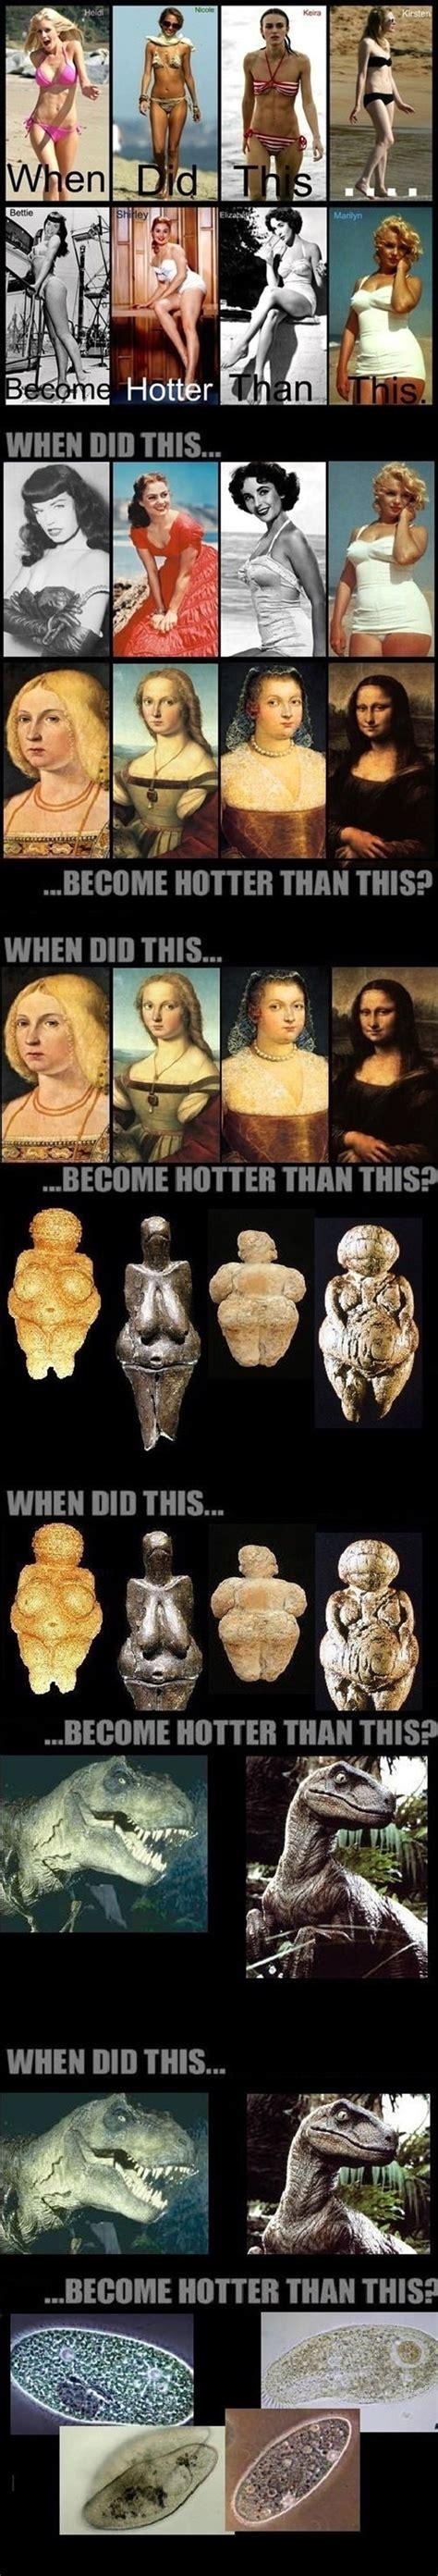 Best Memes Of 2012 - best memes of 2012